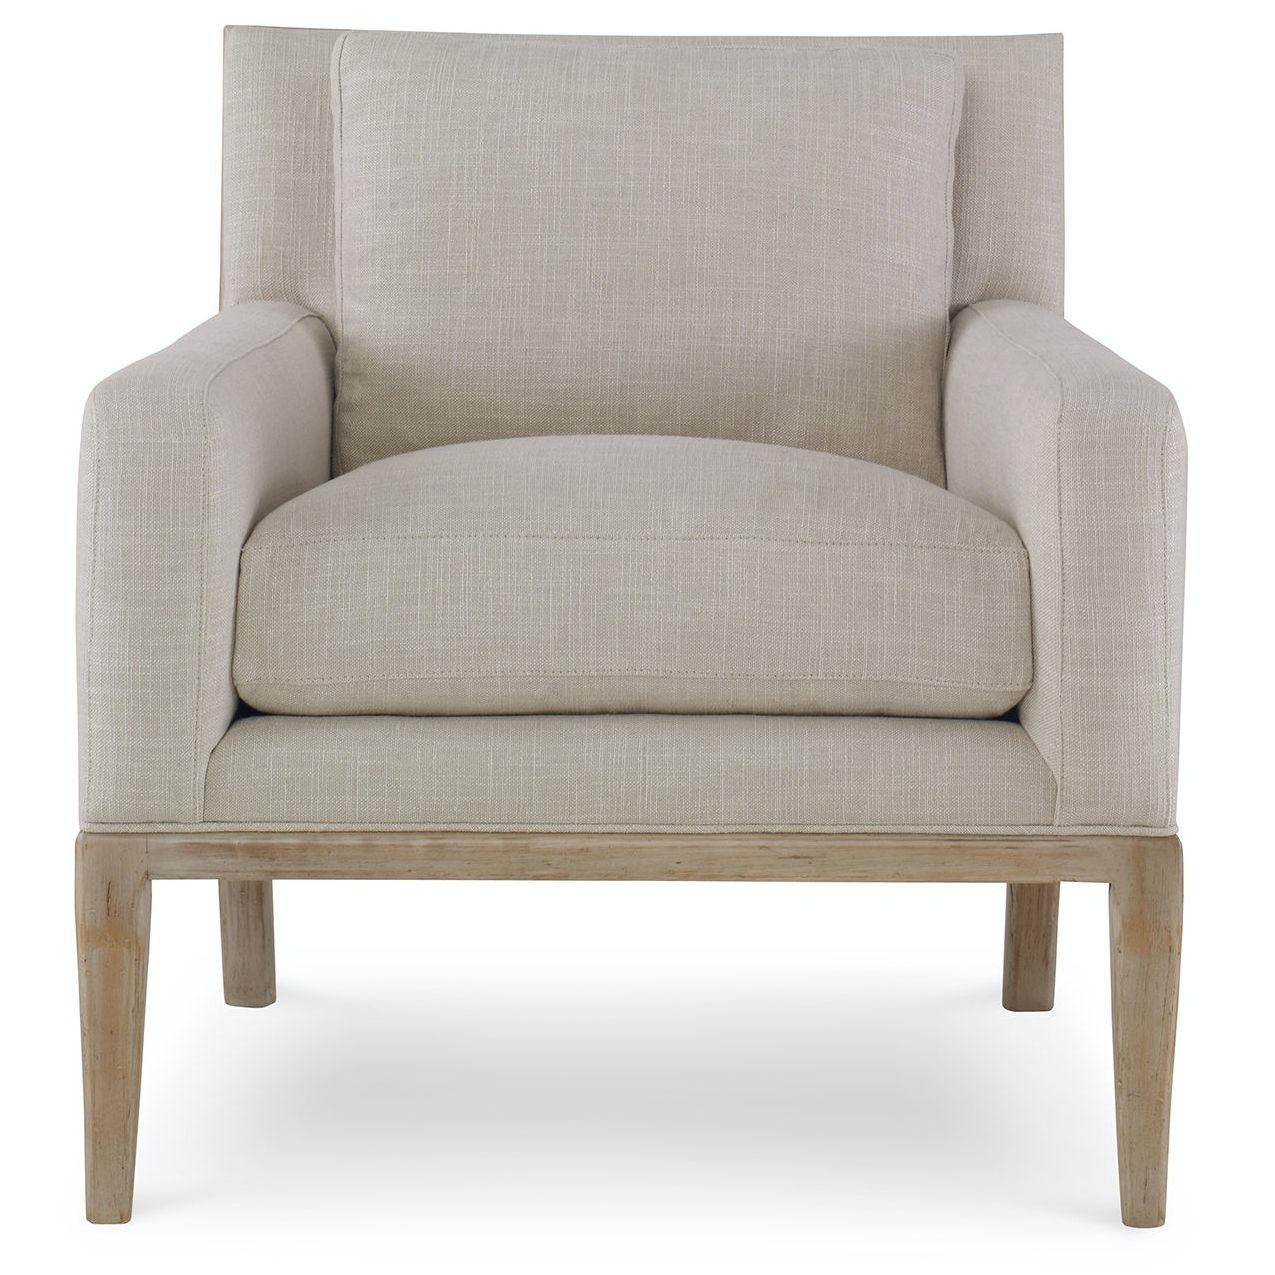 Lee Jofa Spencer Arm Chair H3811 20